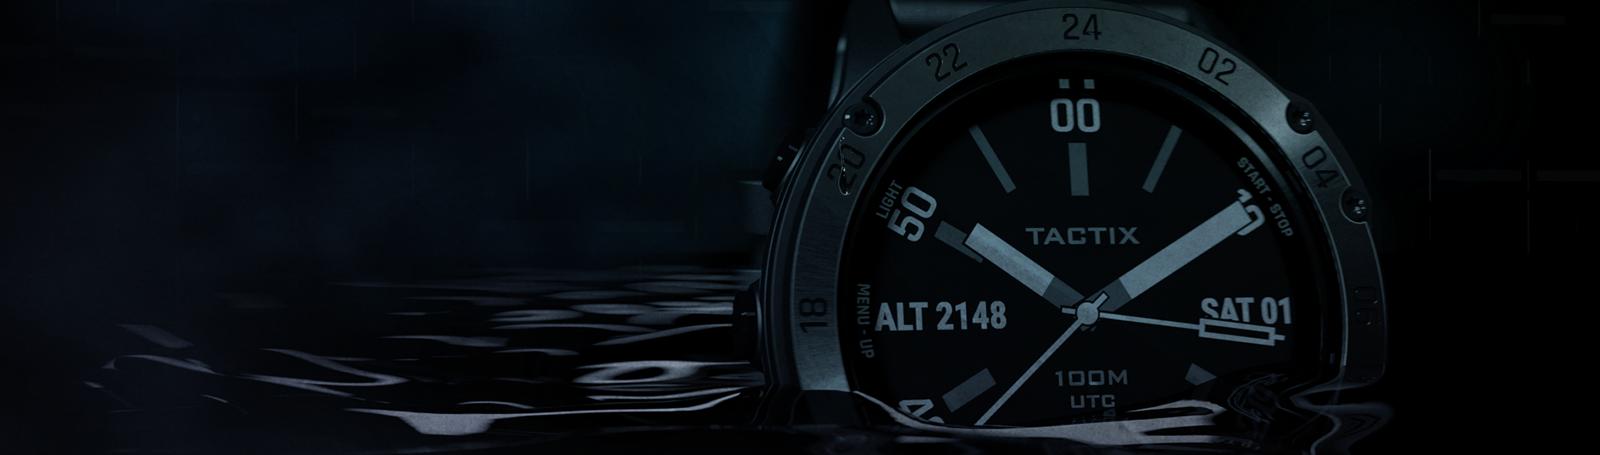 Tactix® Delta - Phiên bản Sapphire 45